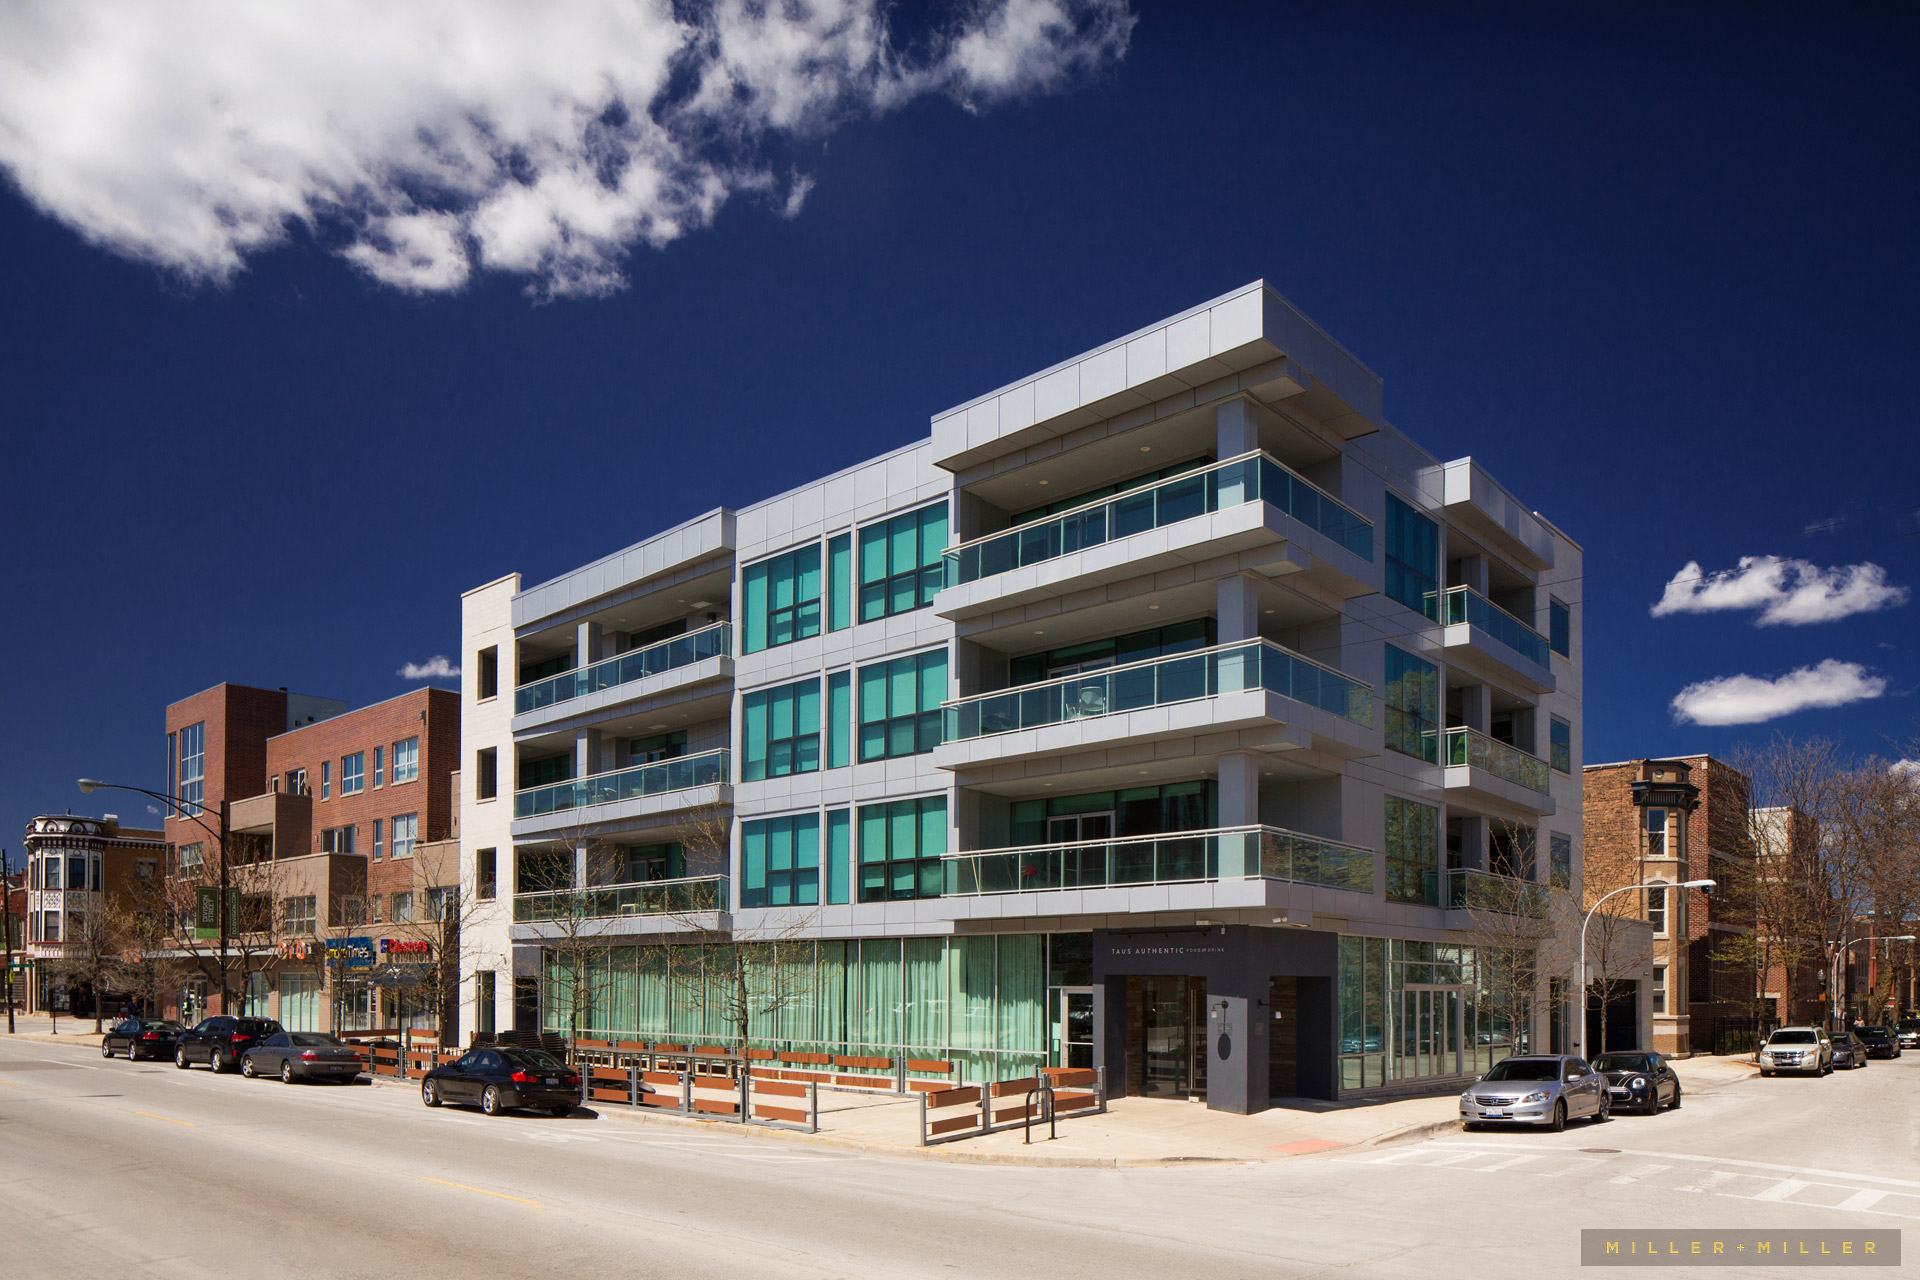 residential-properties-modern-loft-condominium-building